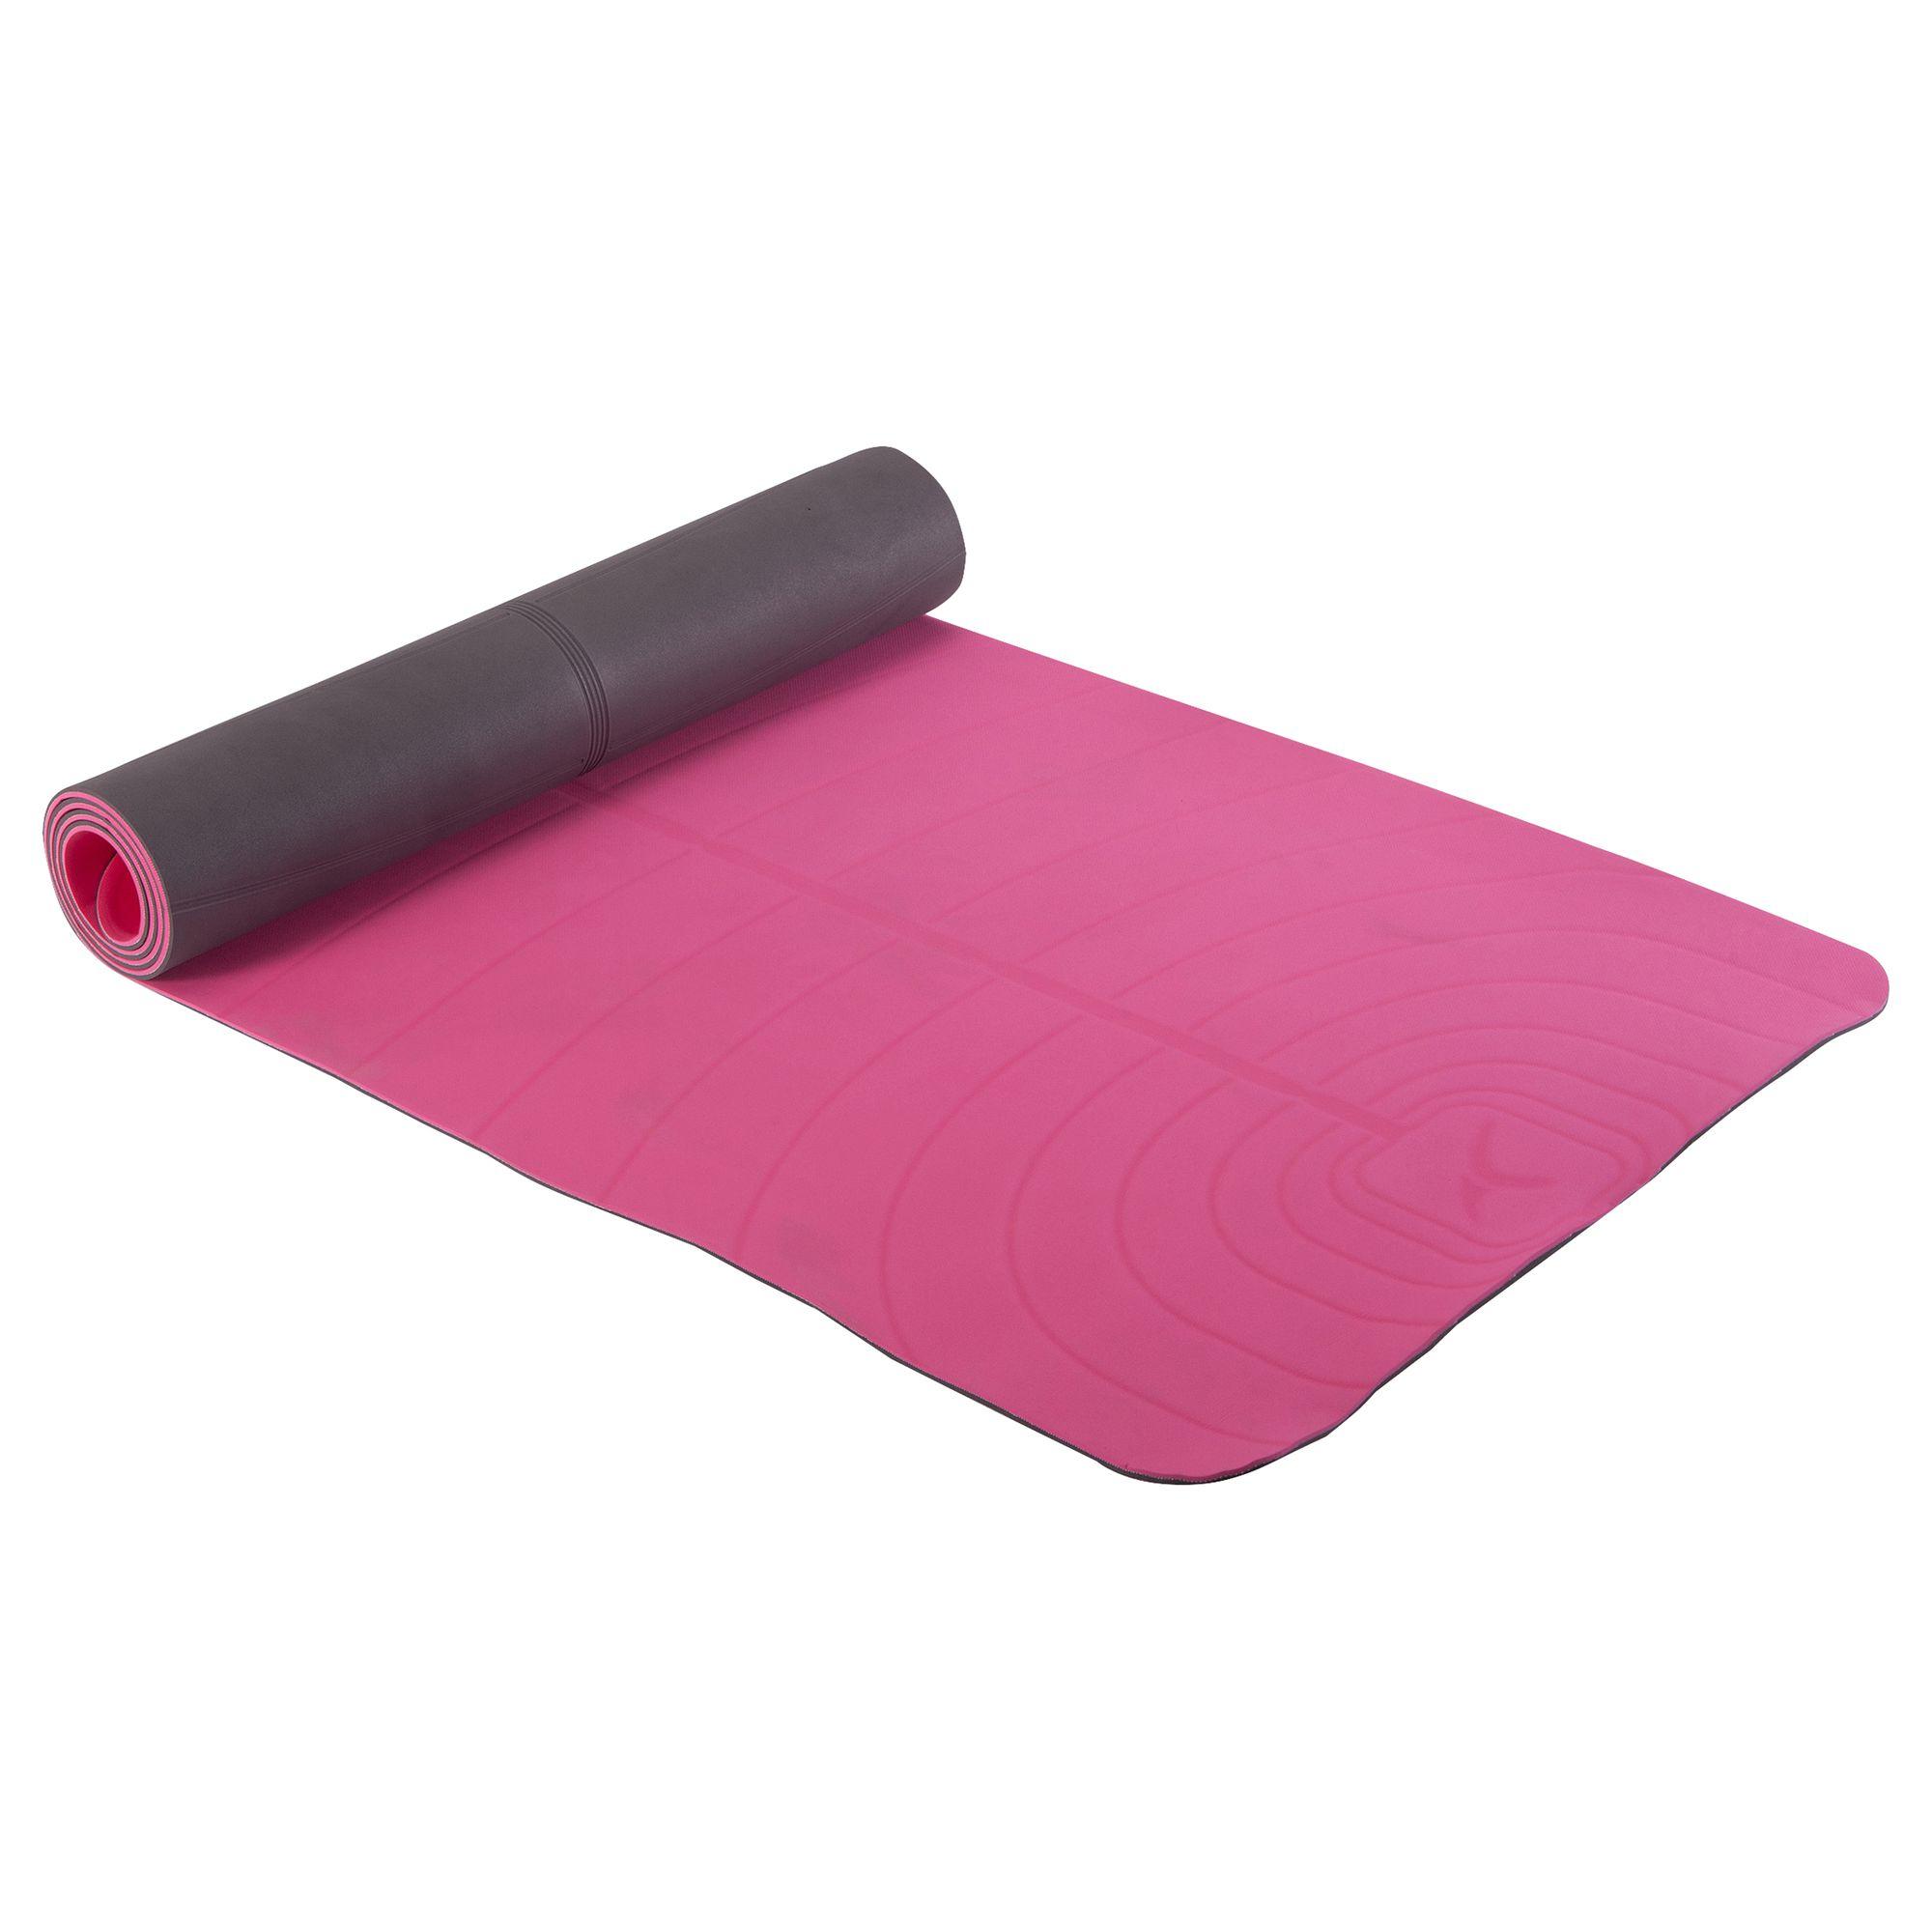 Tapis de yoga CLUB 5 mm rose